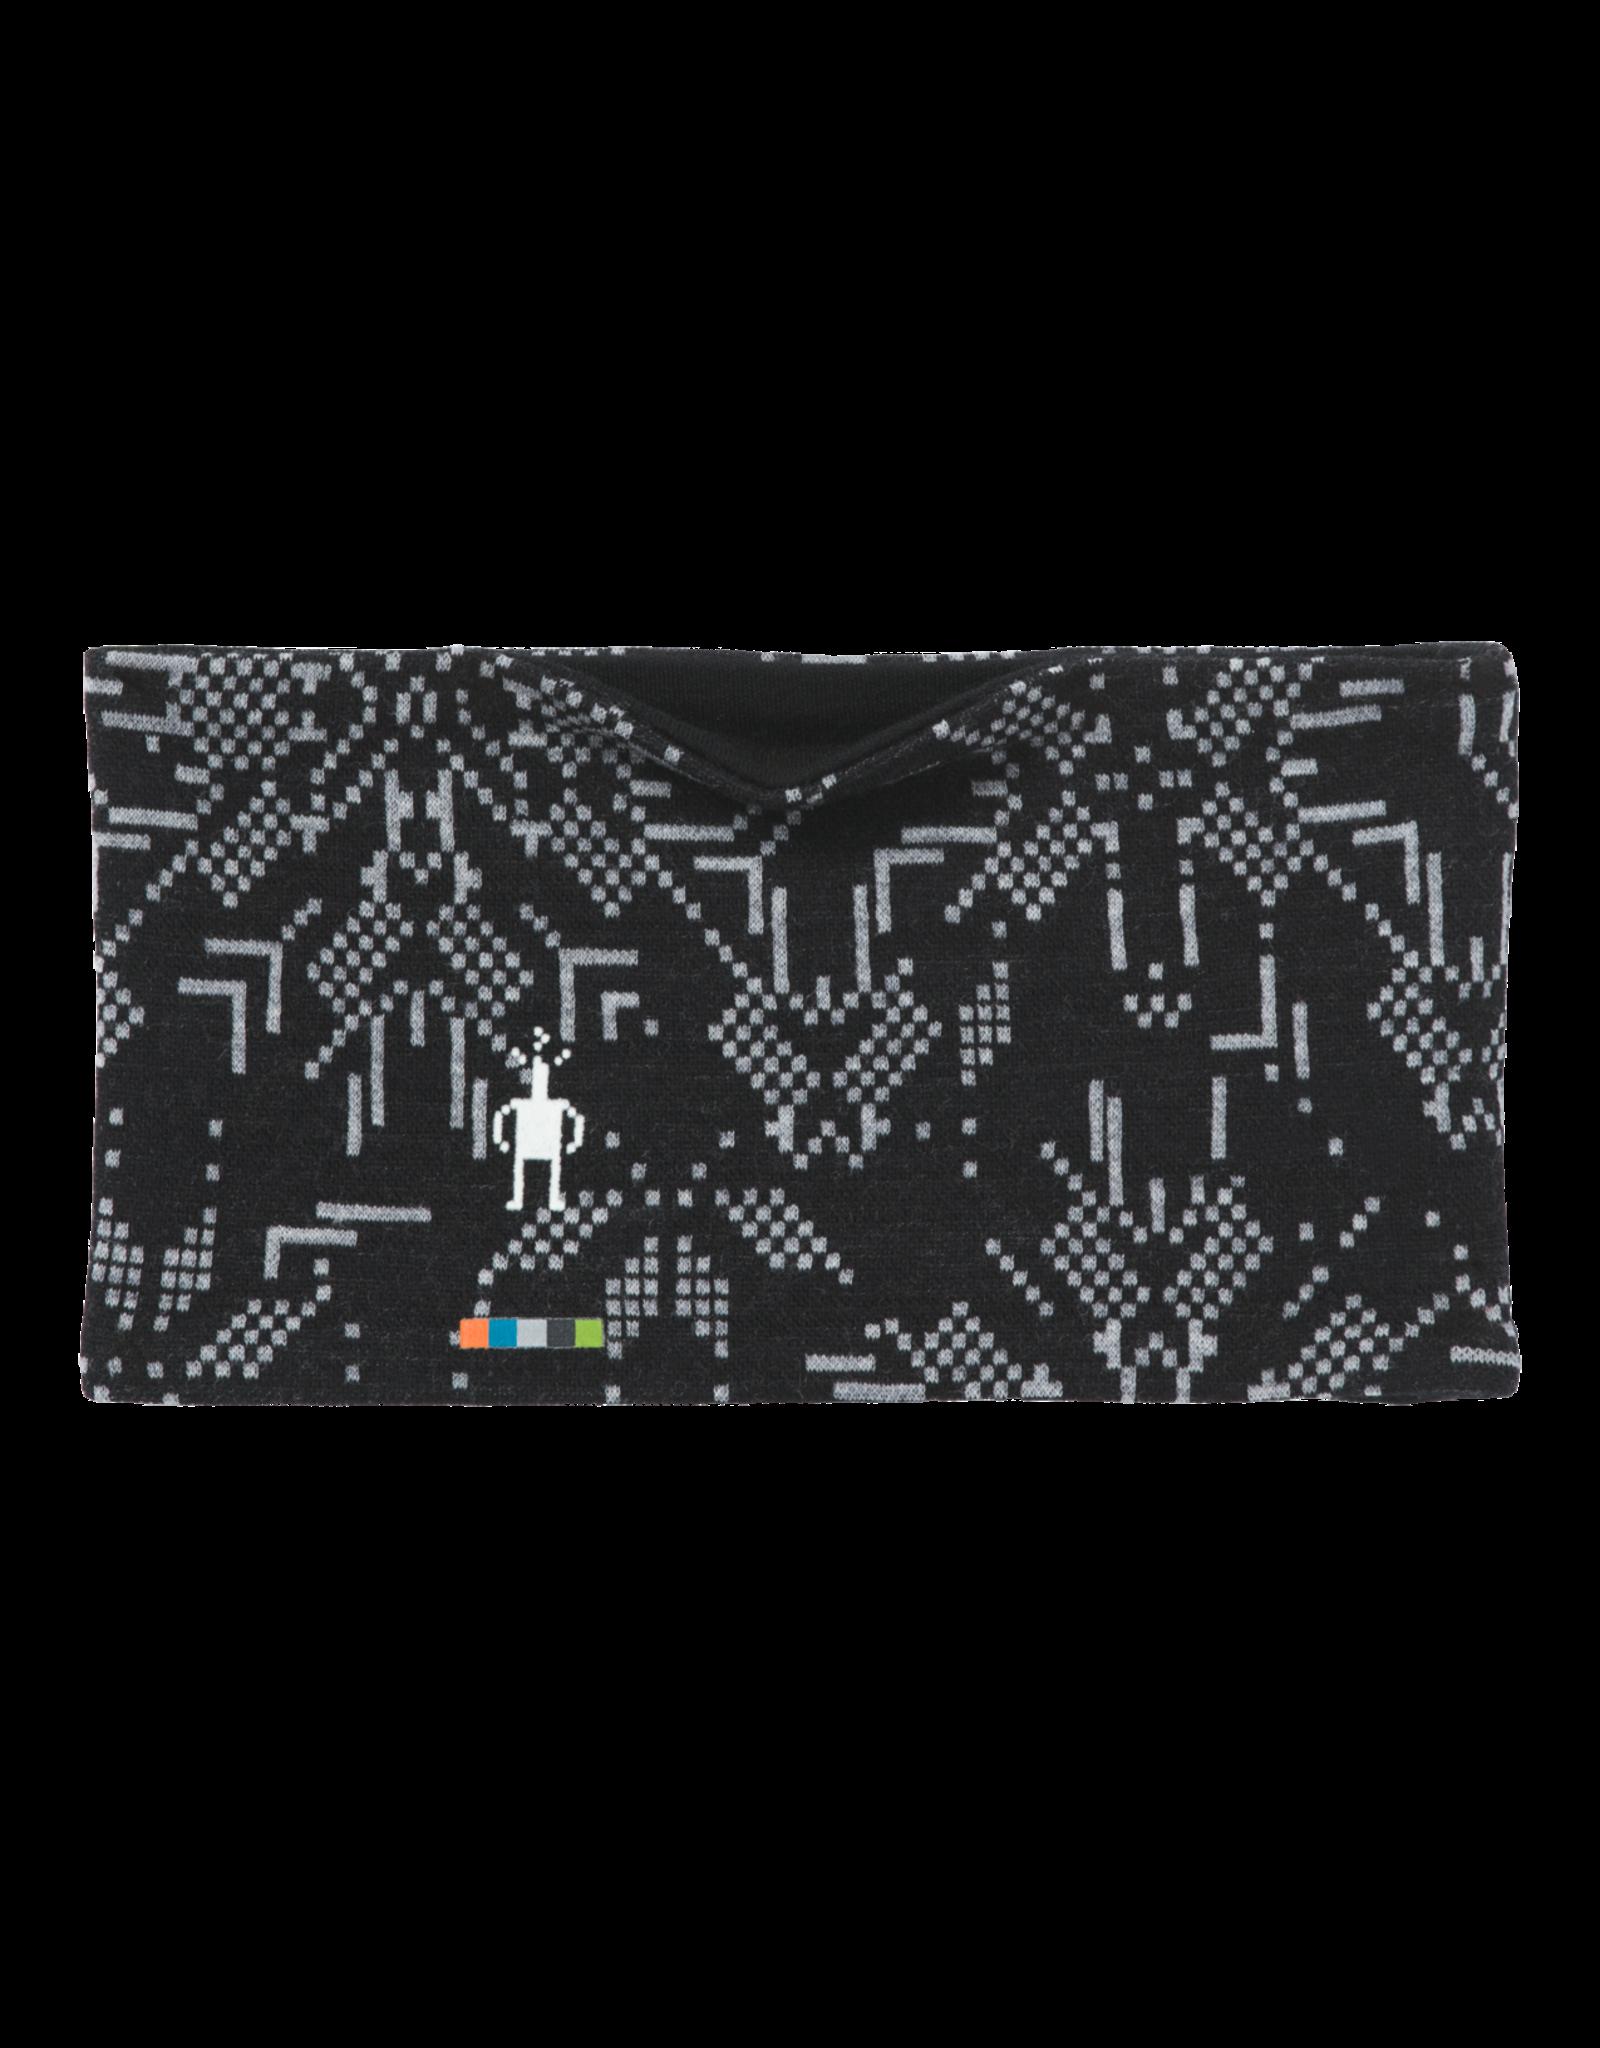 Smartwool Merino 250 Pattern Reversible Headband Black Digital Snowflake